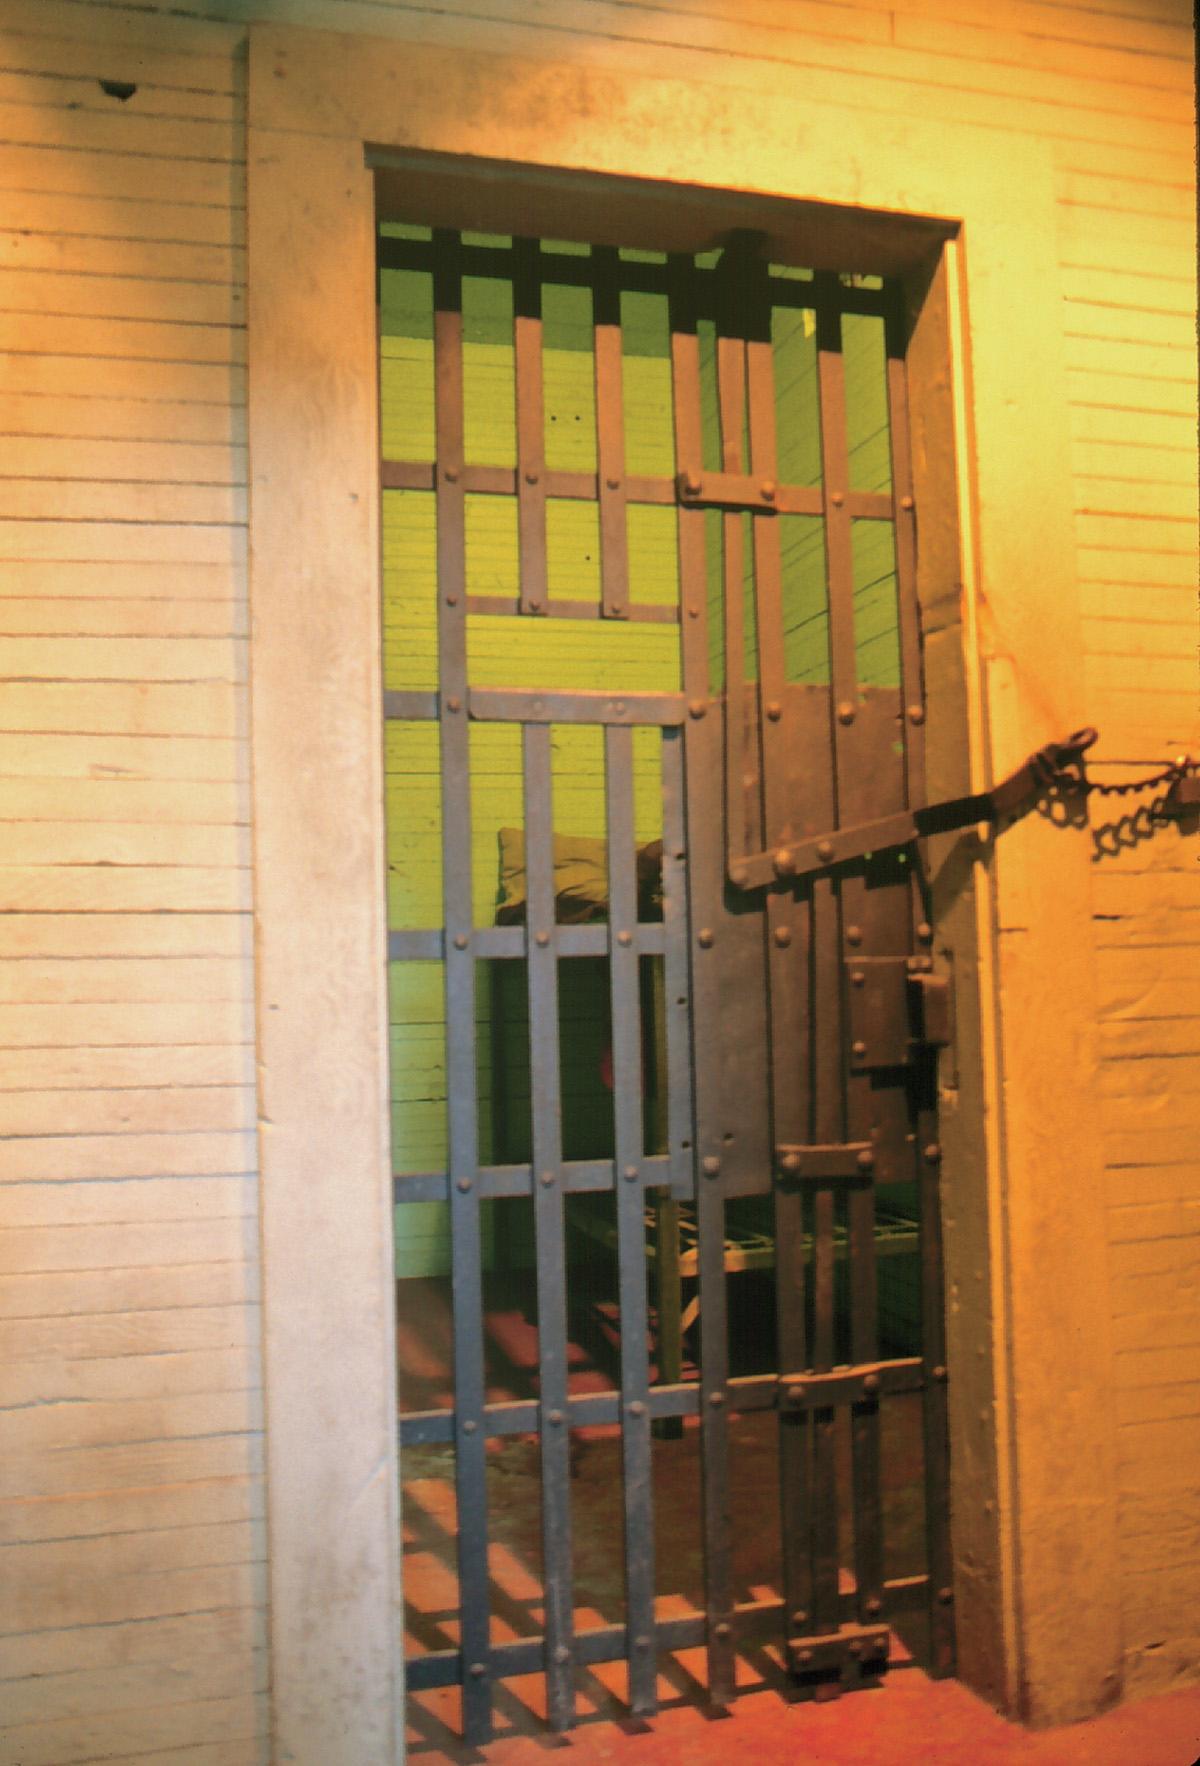 Black Bart Slept Here, Calaveras County Jail